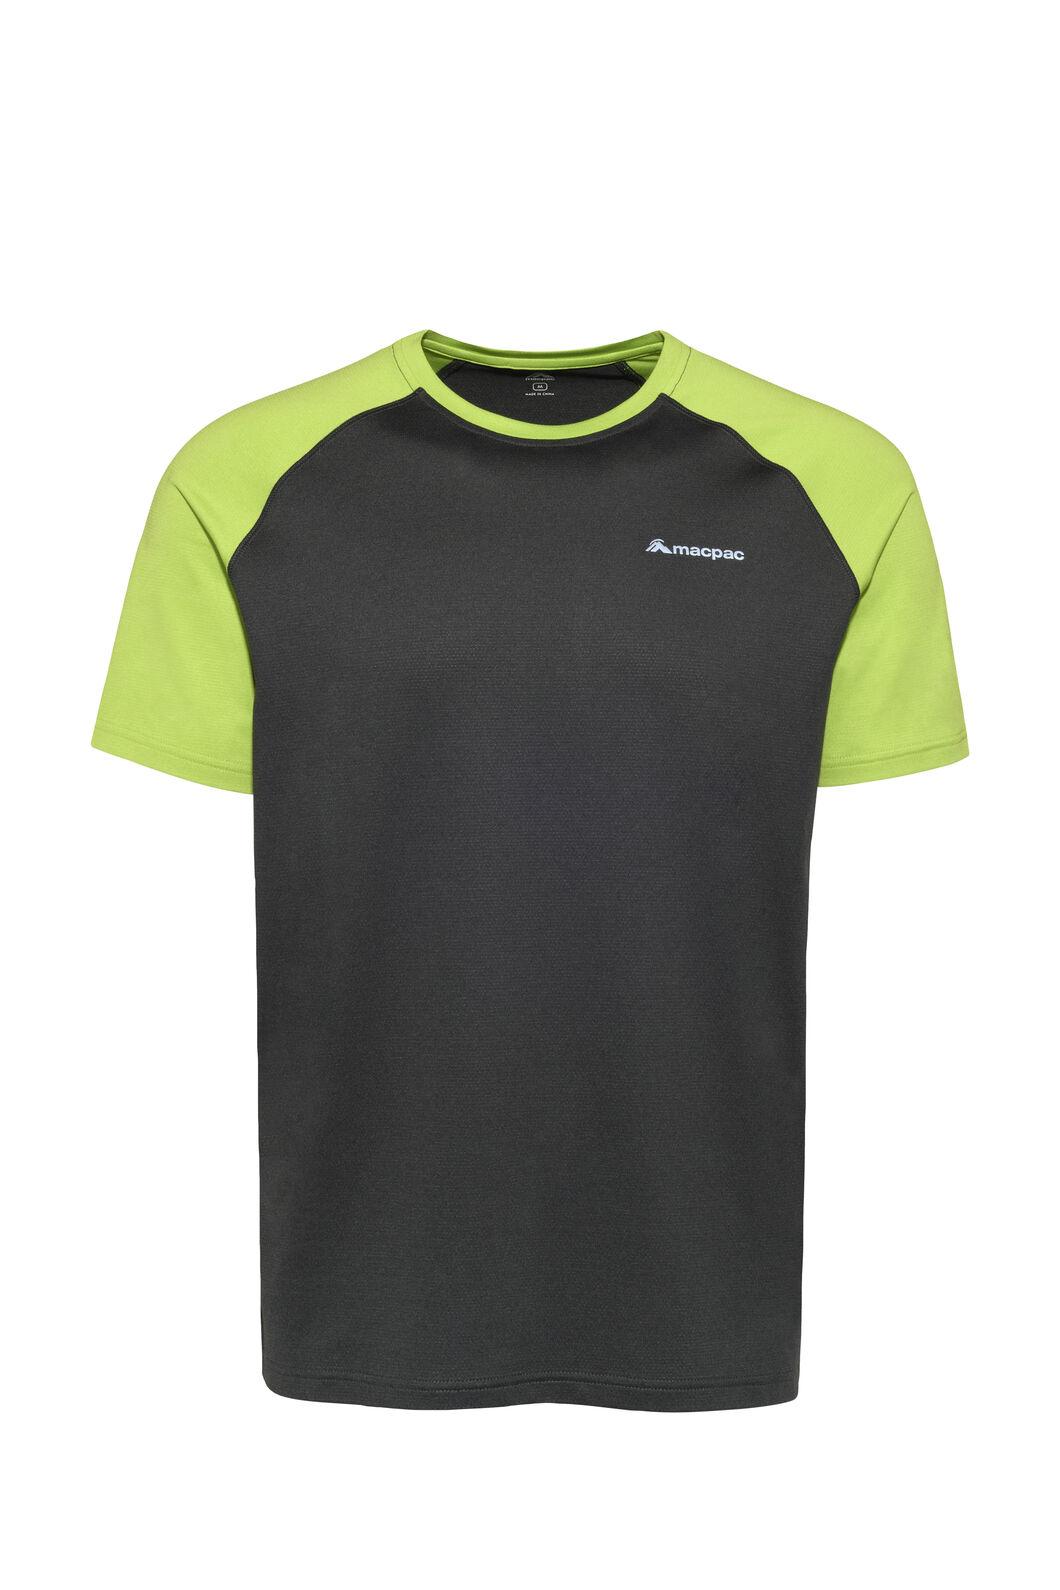 Macpac Eyre Short Sleeve Tee — Men's, Phantom/Macaw Green, hi-res